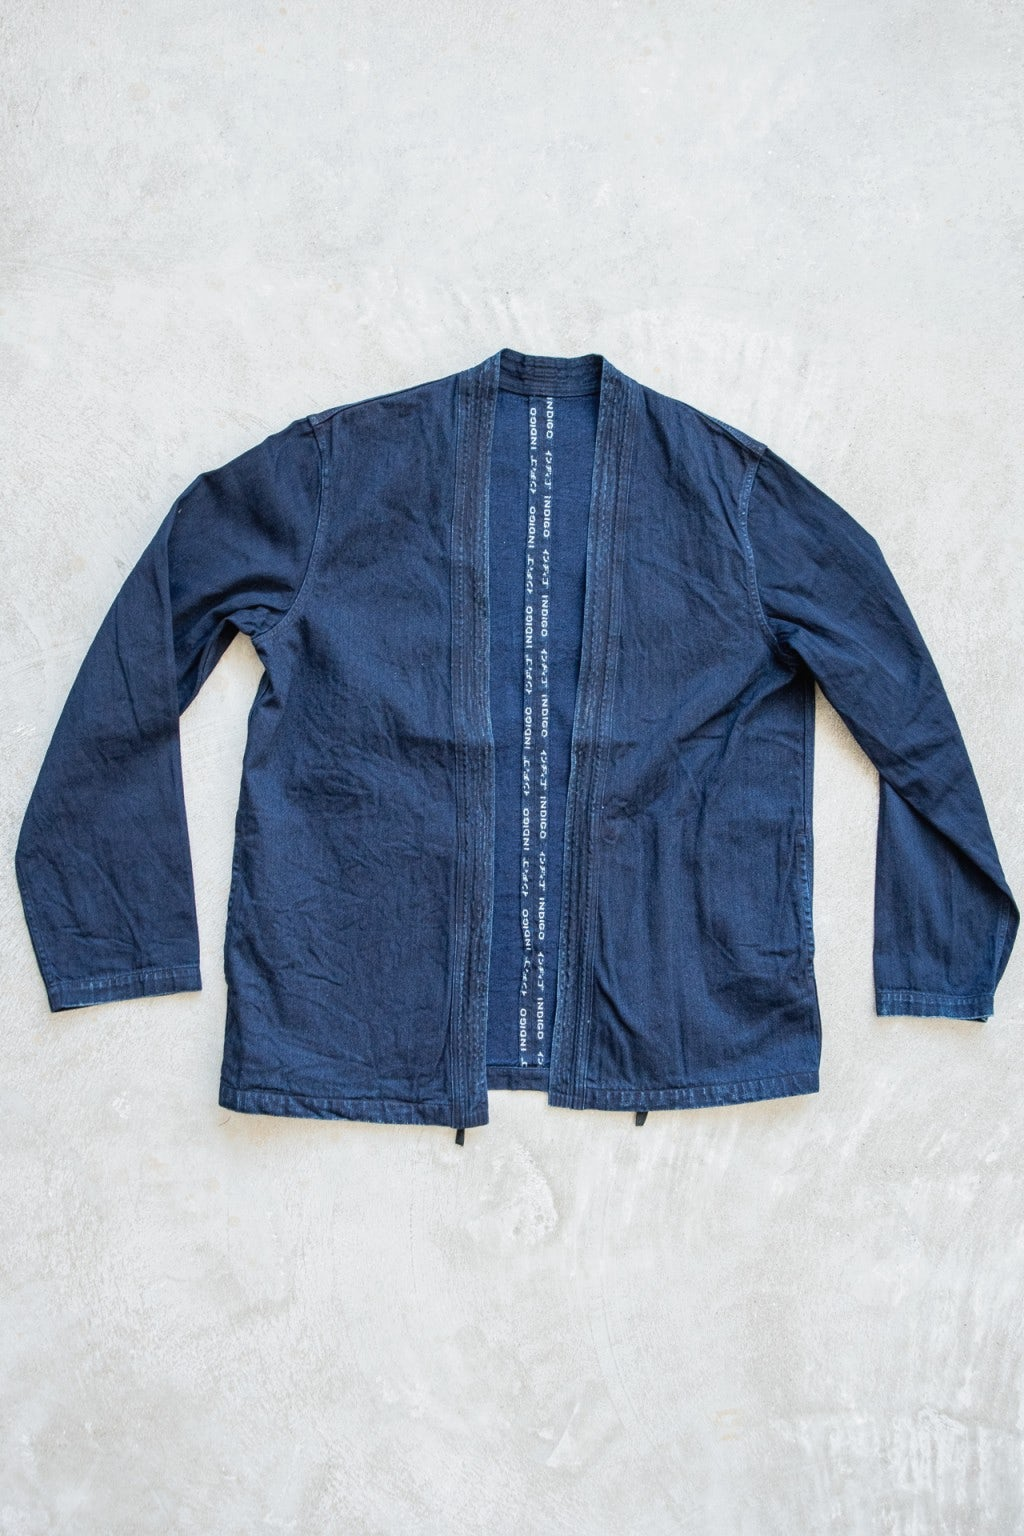 Kapital 8ozIDG x IDG Selvedge Denim KAKASHI Shirt Indigo